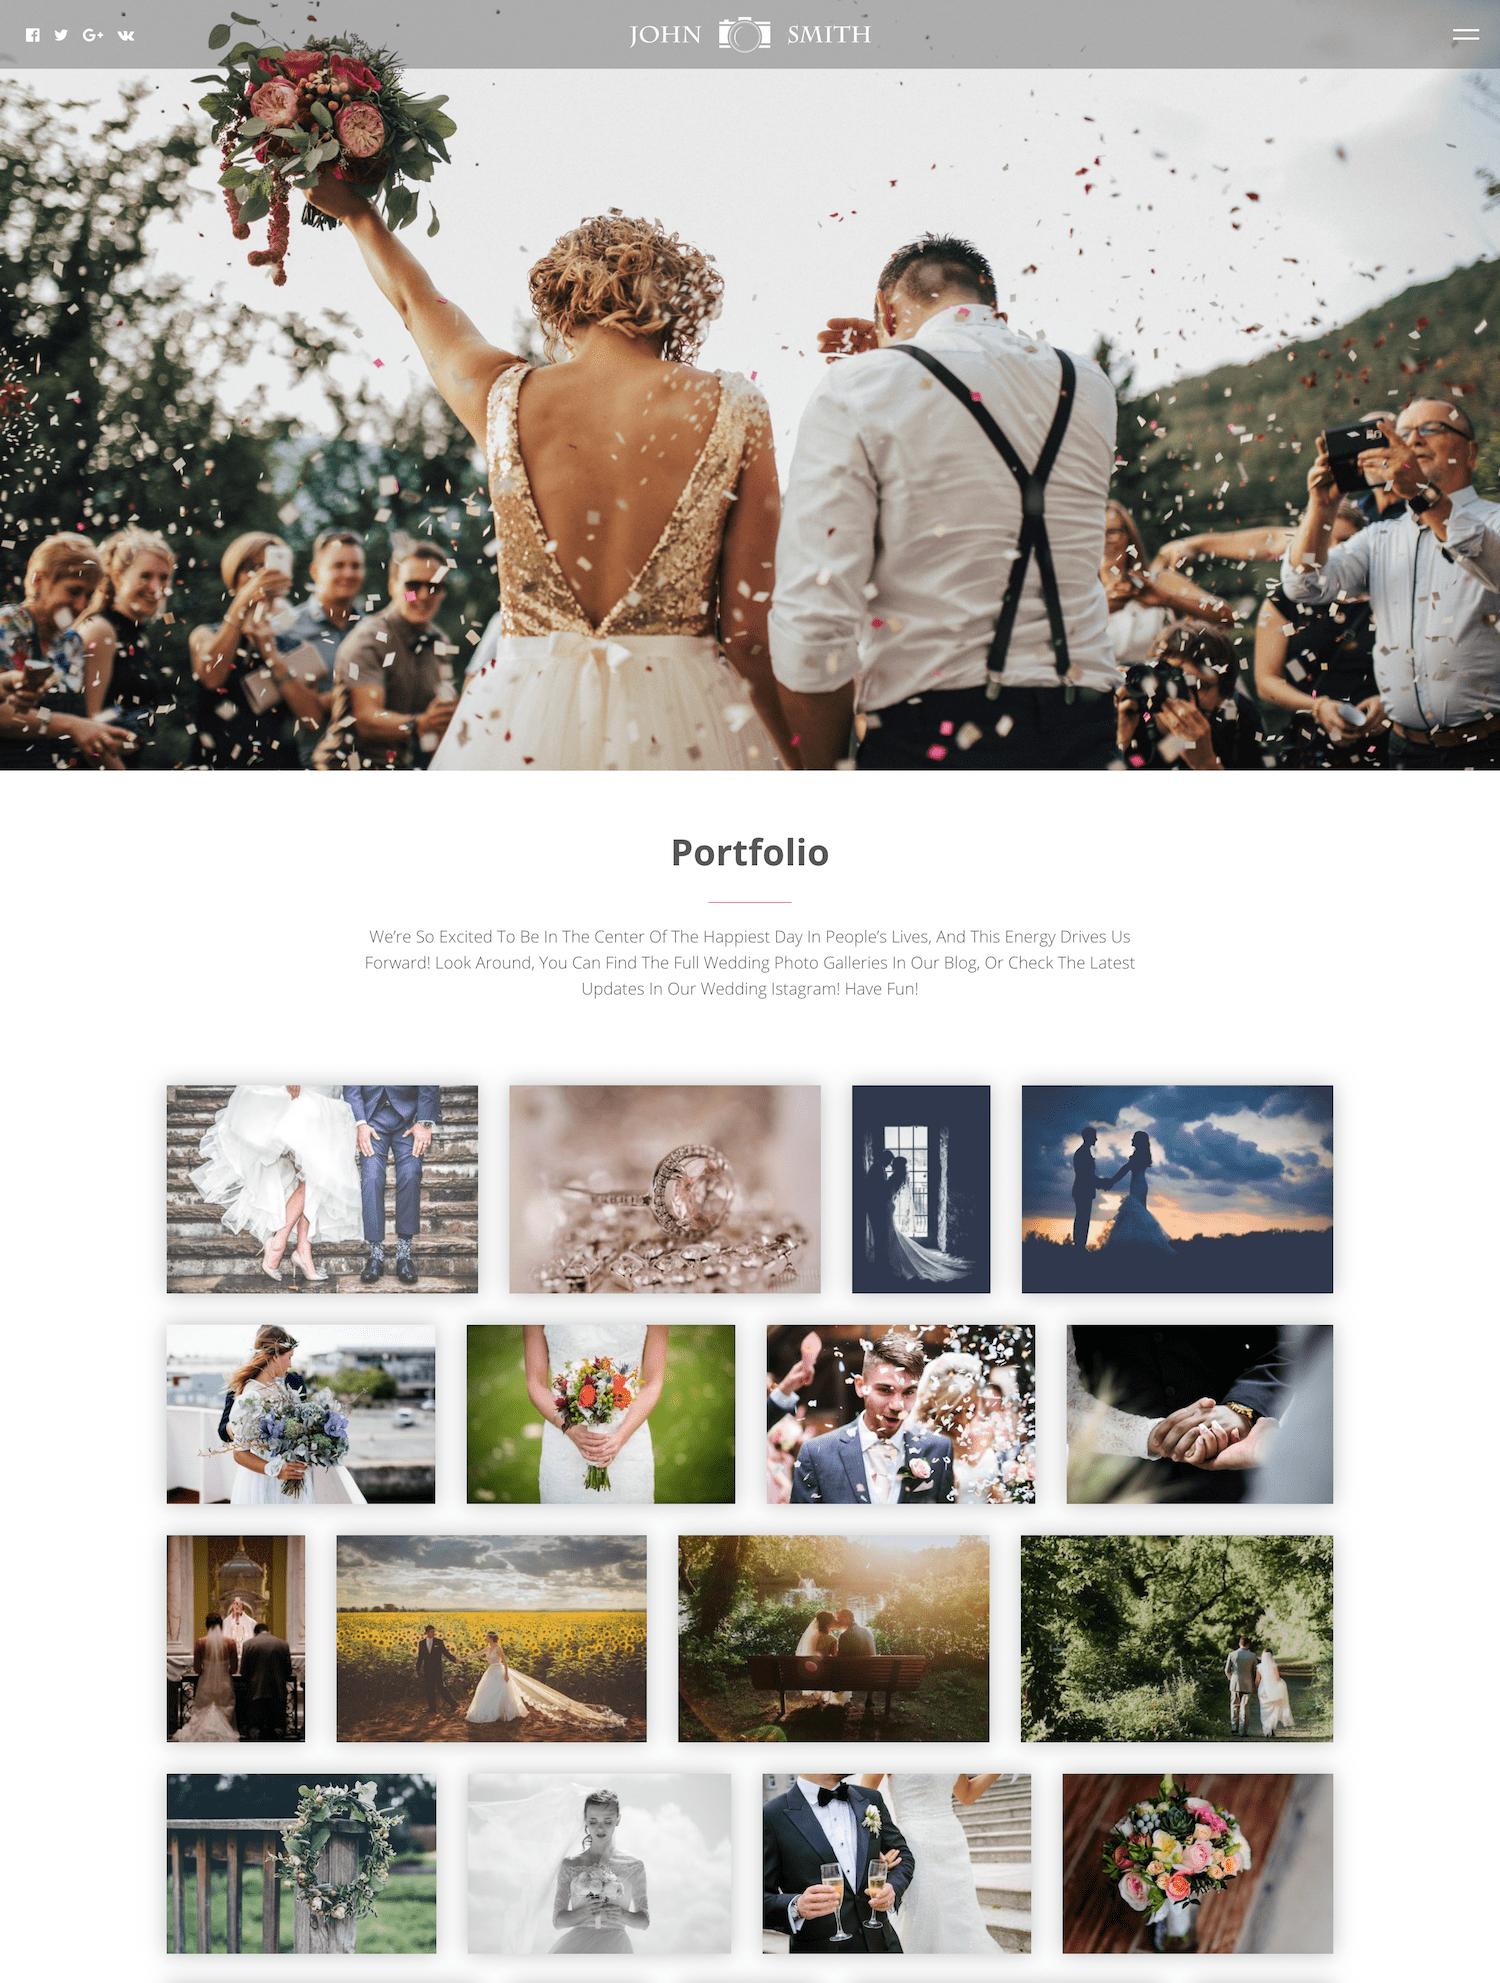 screencapture-max-webs-themforest-marketing-photographer-1519495828489-----kopiya-min Max - Landing Page For Wedding Photographer